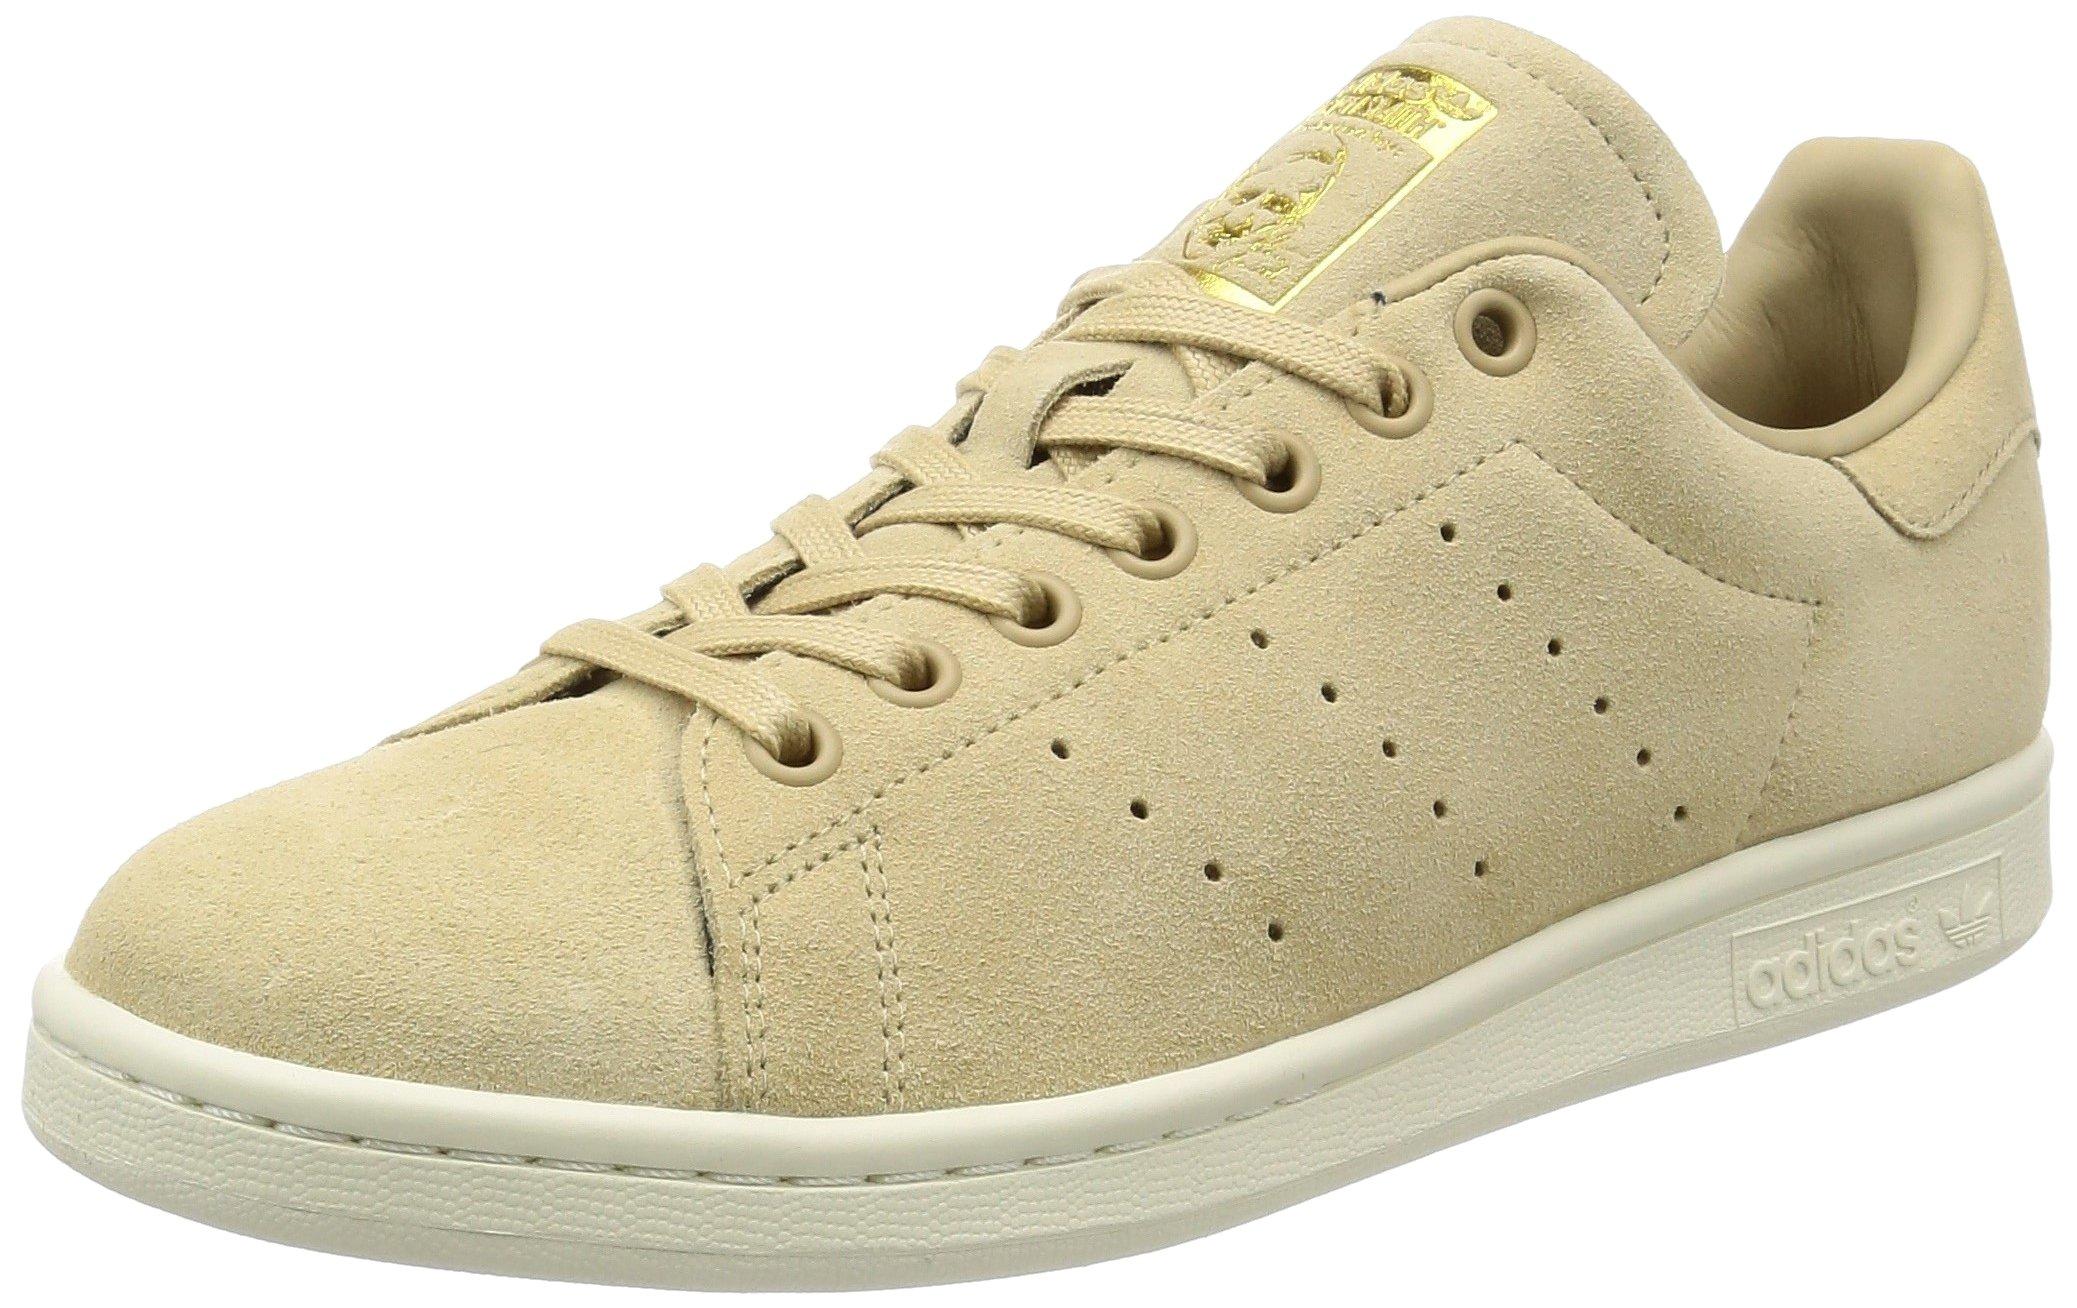 później atrakcyjna cena Nowe Produkty adidas Originals Stan Smith Mens Trainers Sneakers (UK 4.5 US 5 EU 37 1/3,  Linen Khaki Off White BB0039)